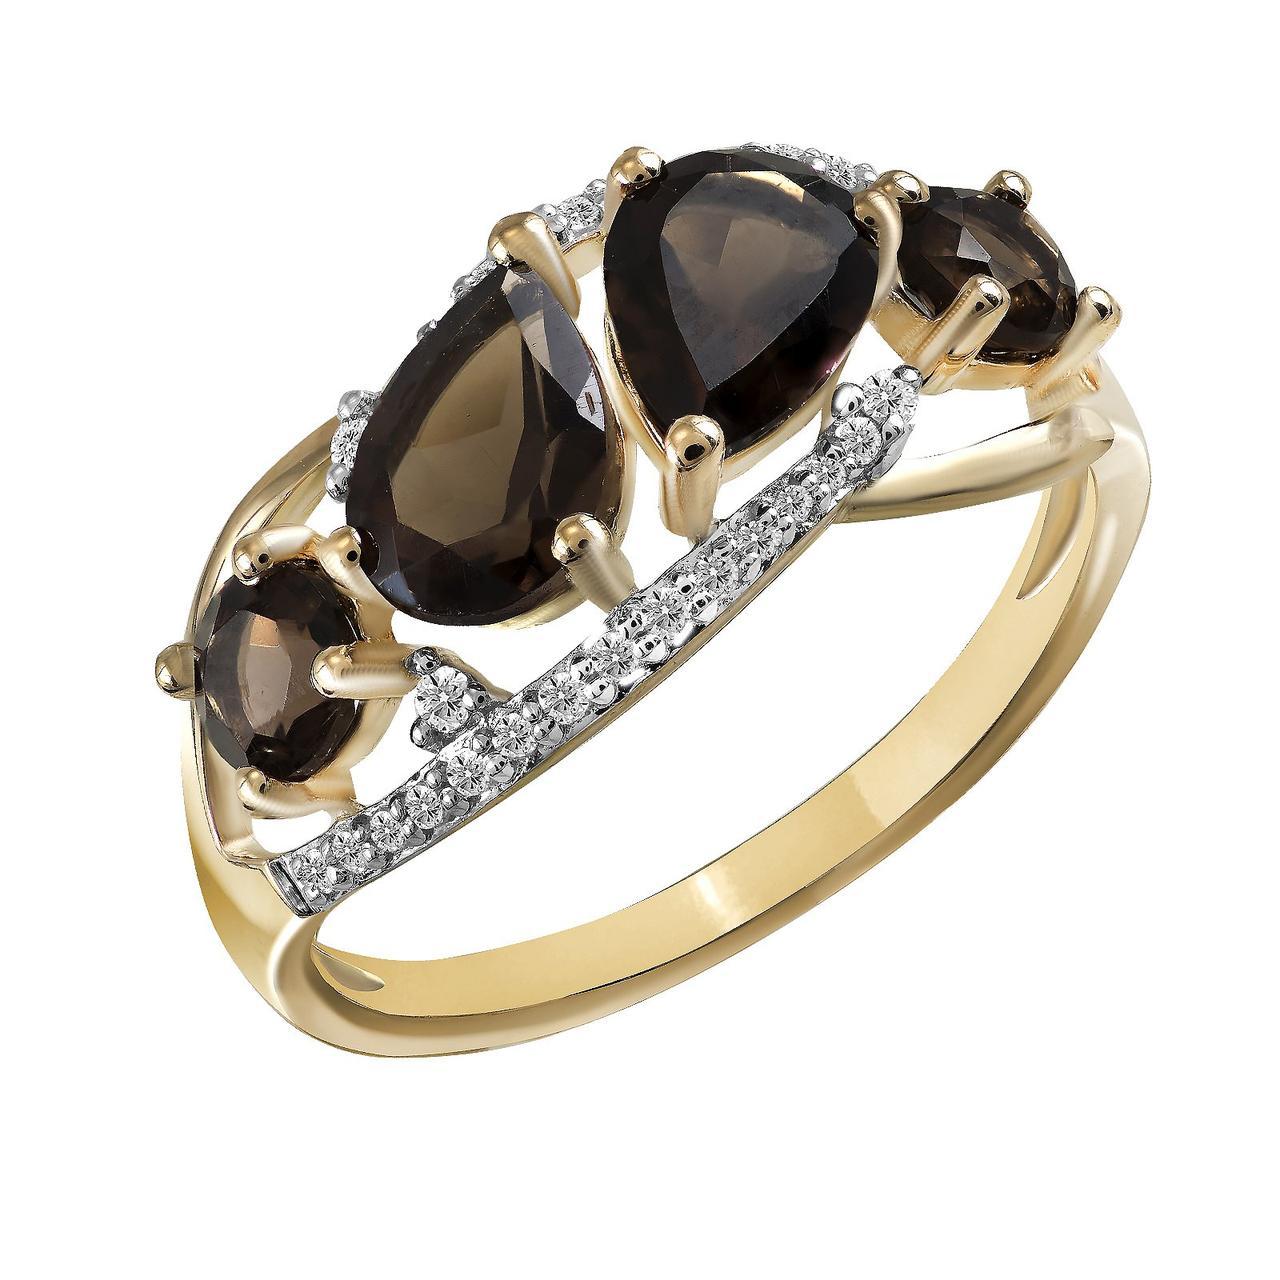 Золотое кольцо с бриллиантами и кварцем, размер 16.5 (825138)